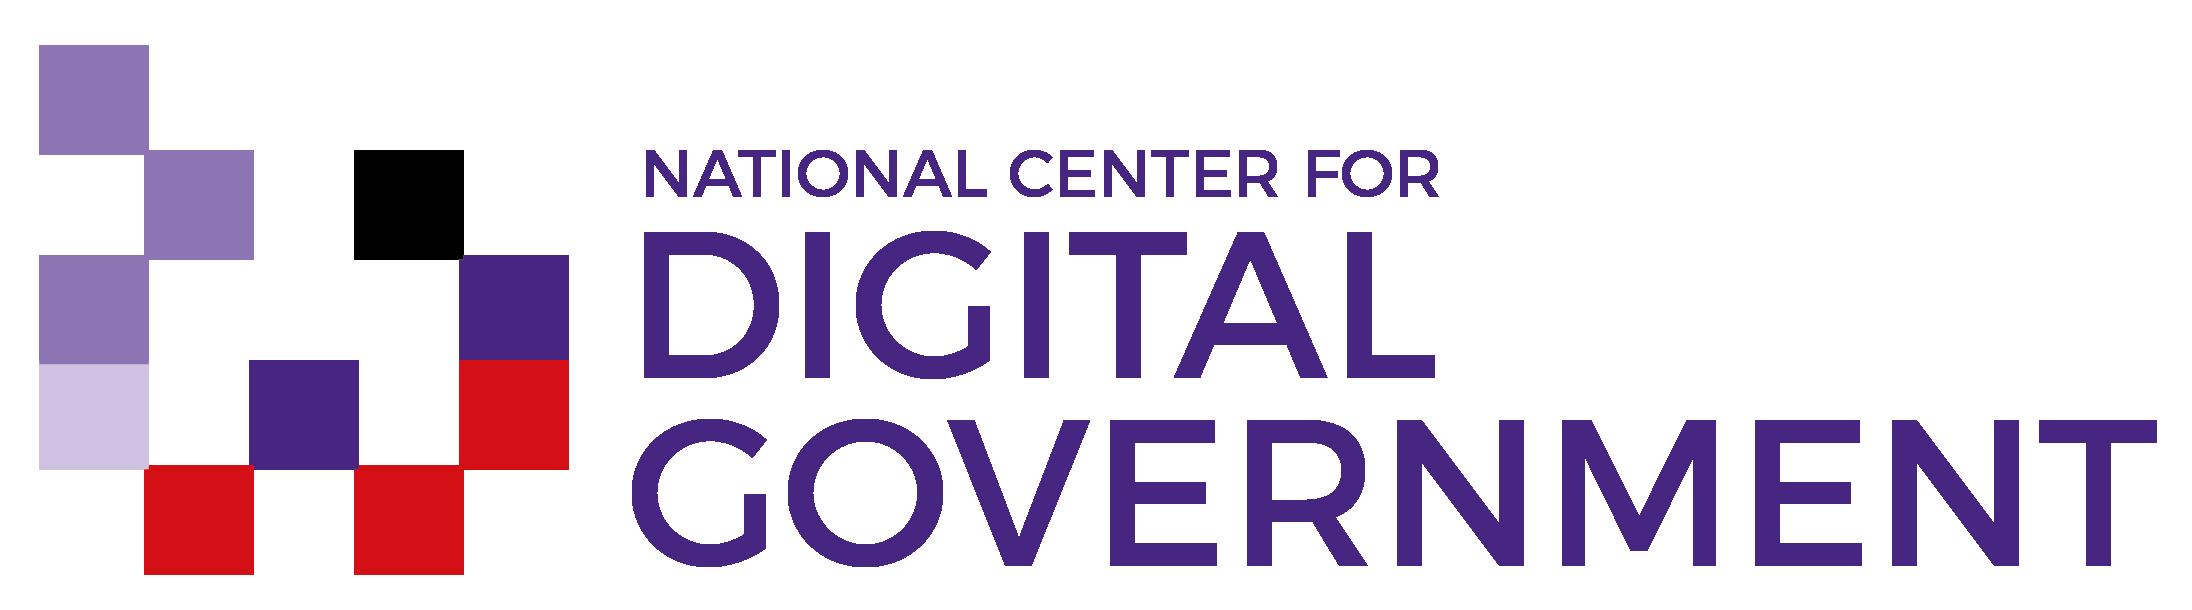 National Center for Digital Government | UMass Amherst